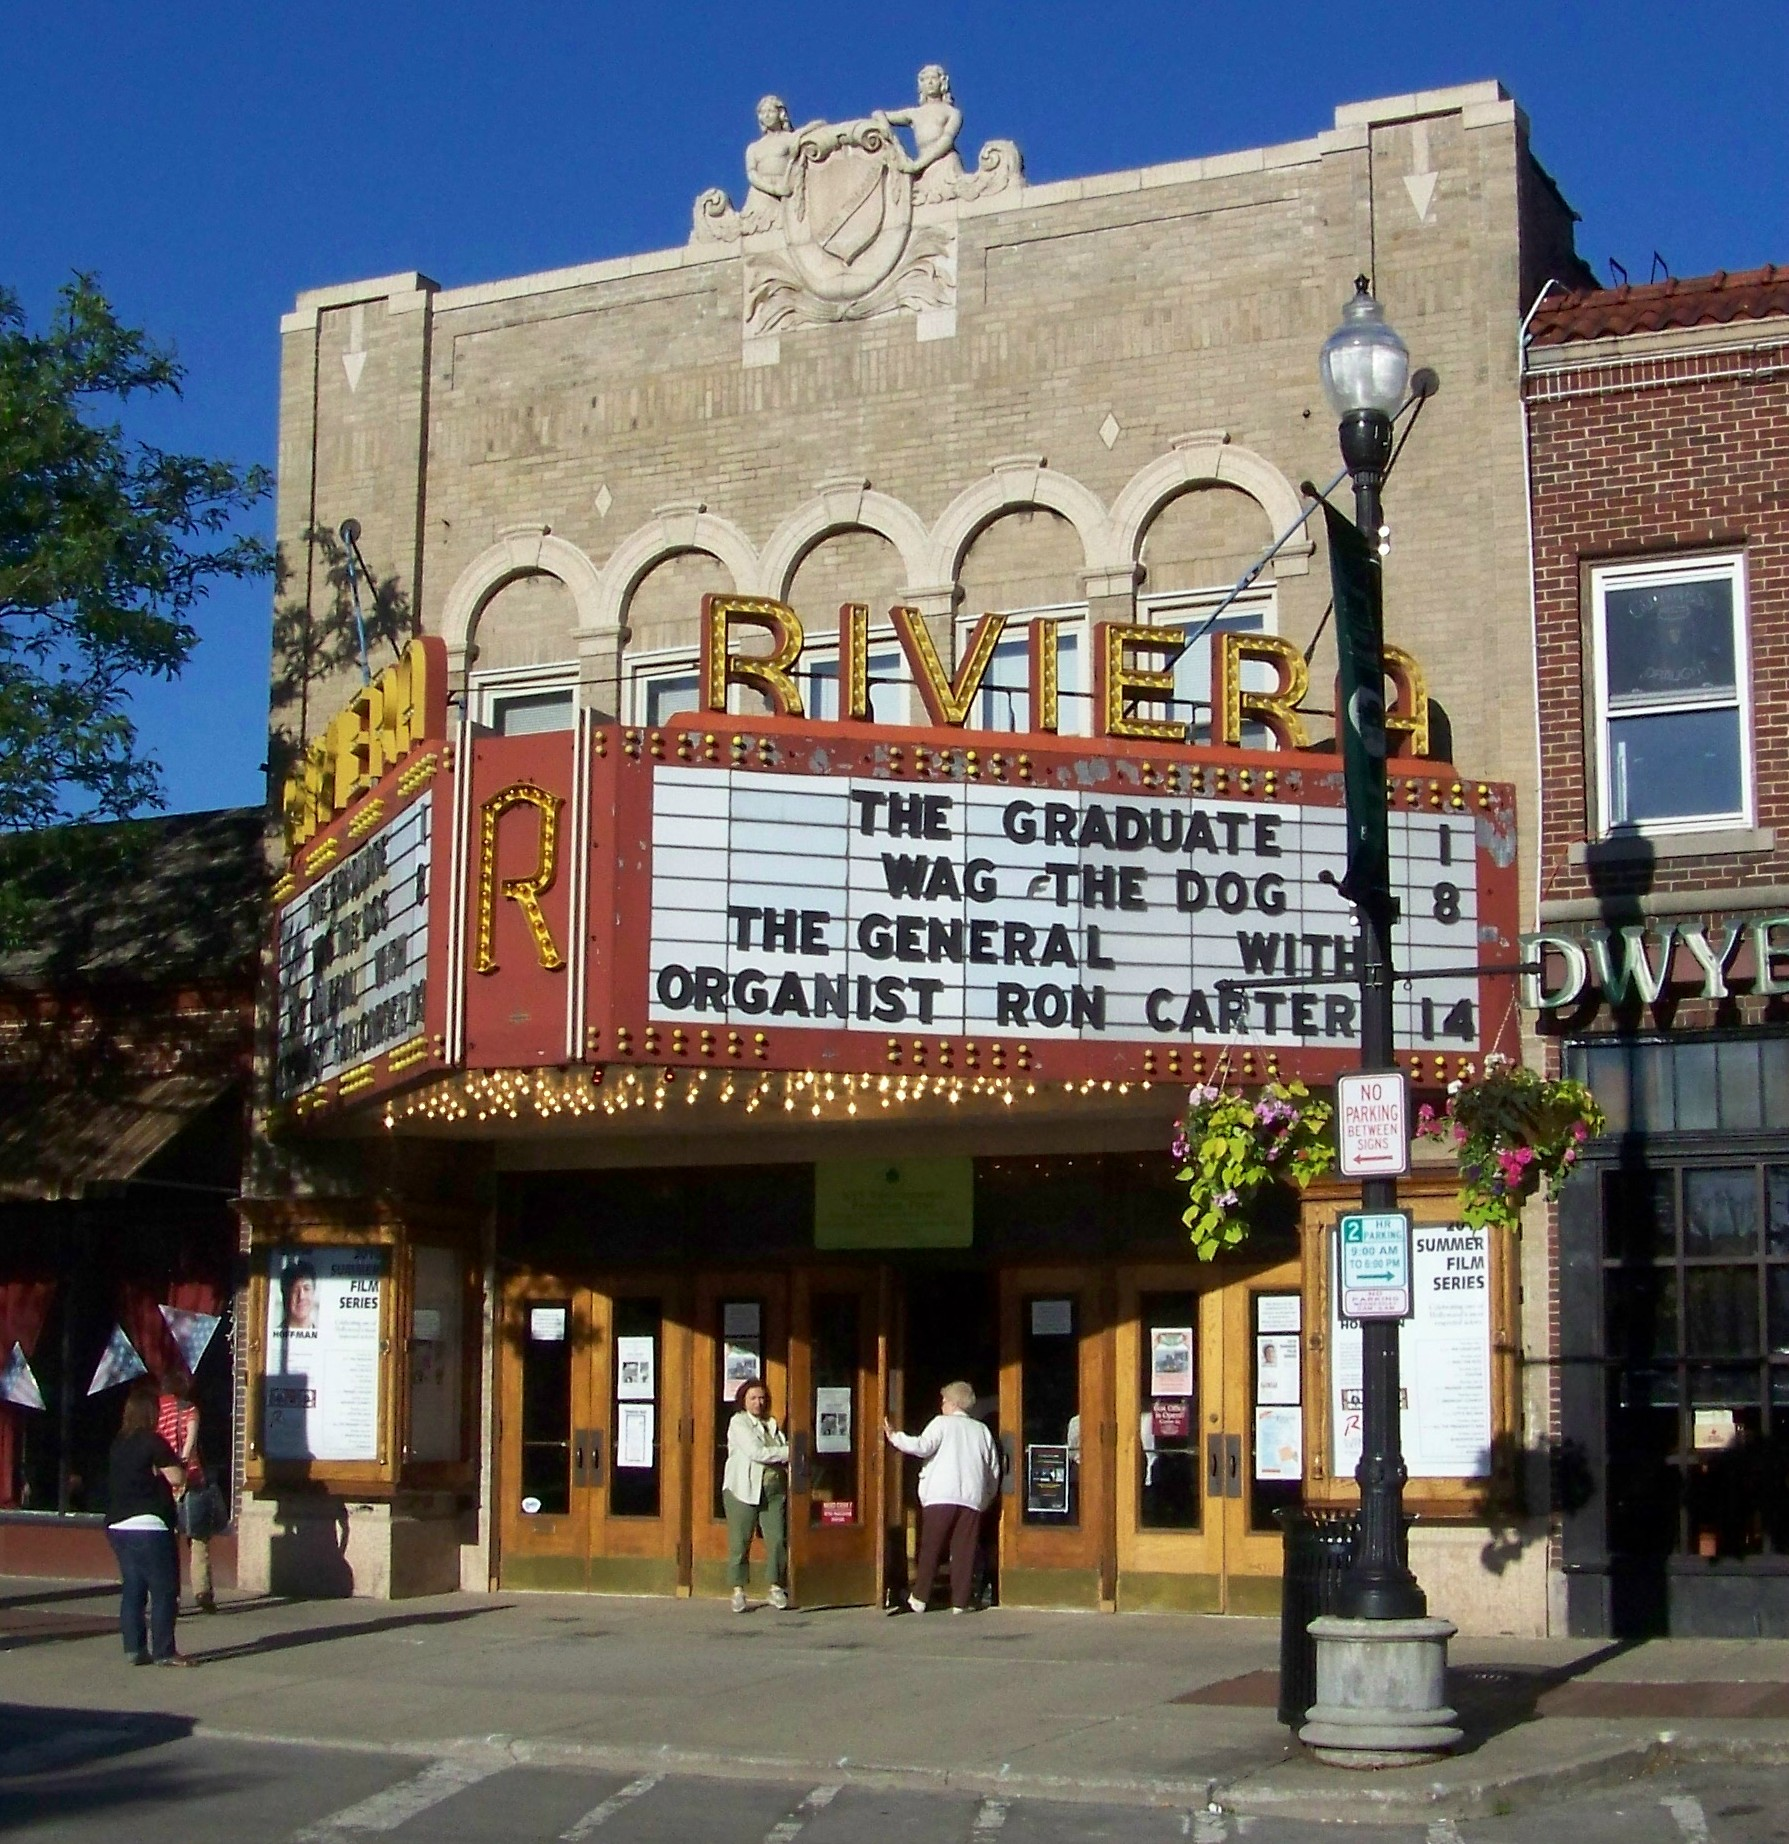 Summer Film Festival In A Classic Old Theatre Niagara At